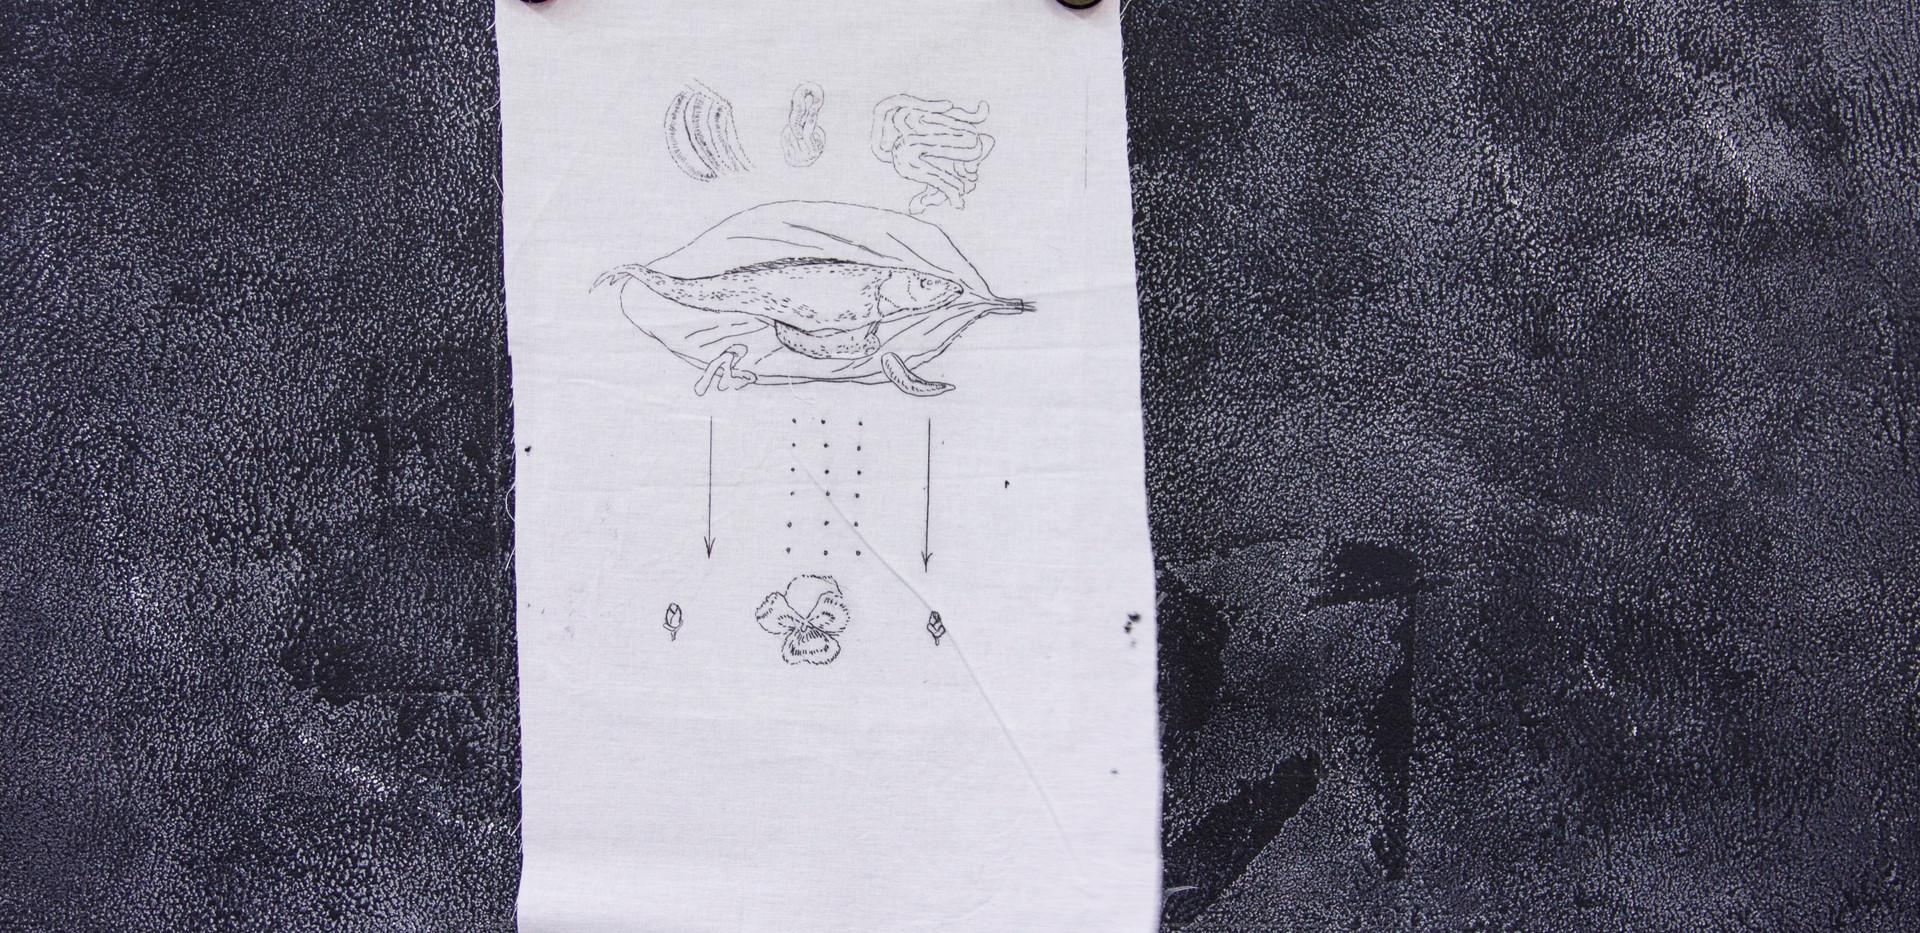 s2 (146).jpg